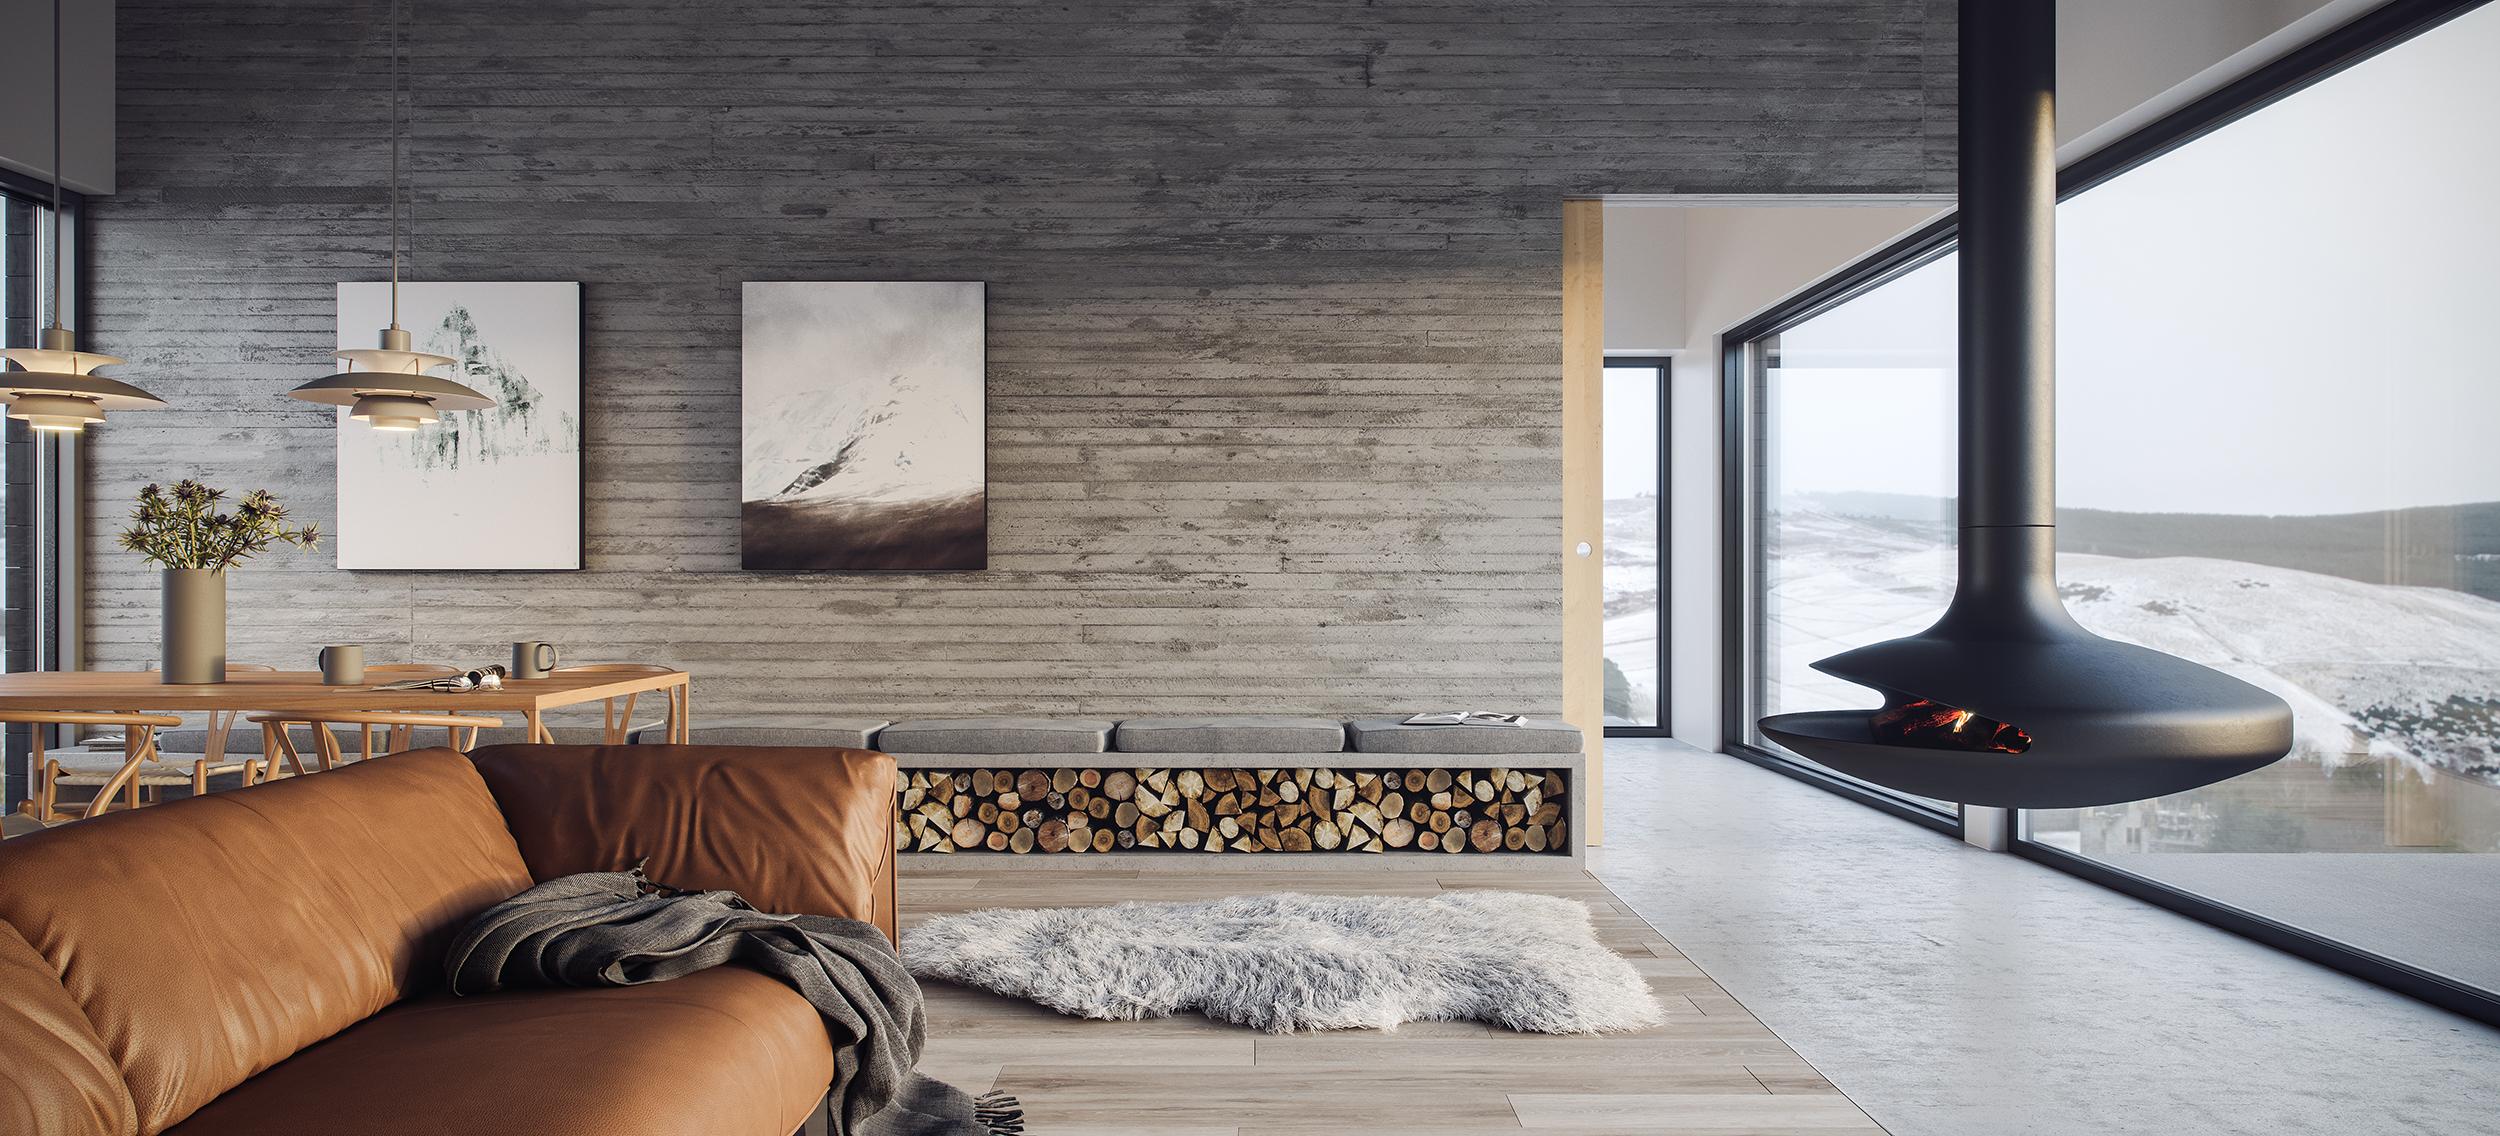 stove, gyrofocus, concrete, timber, glass, view, highlands, cairngorms